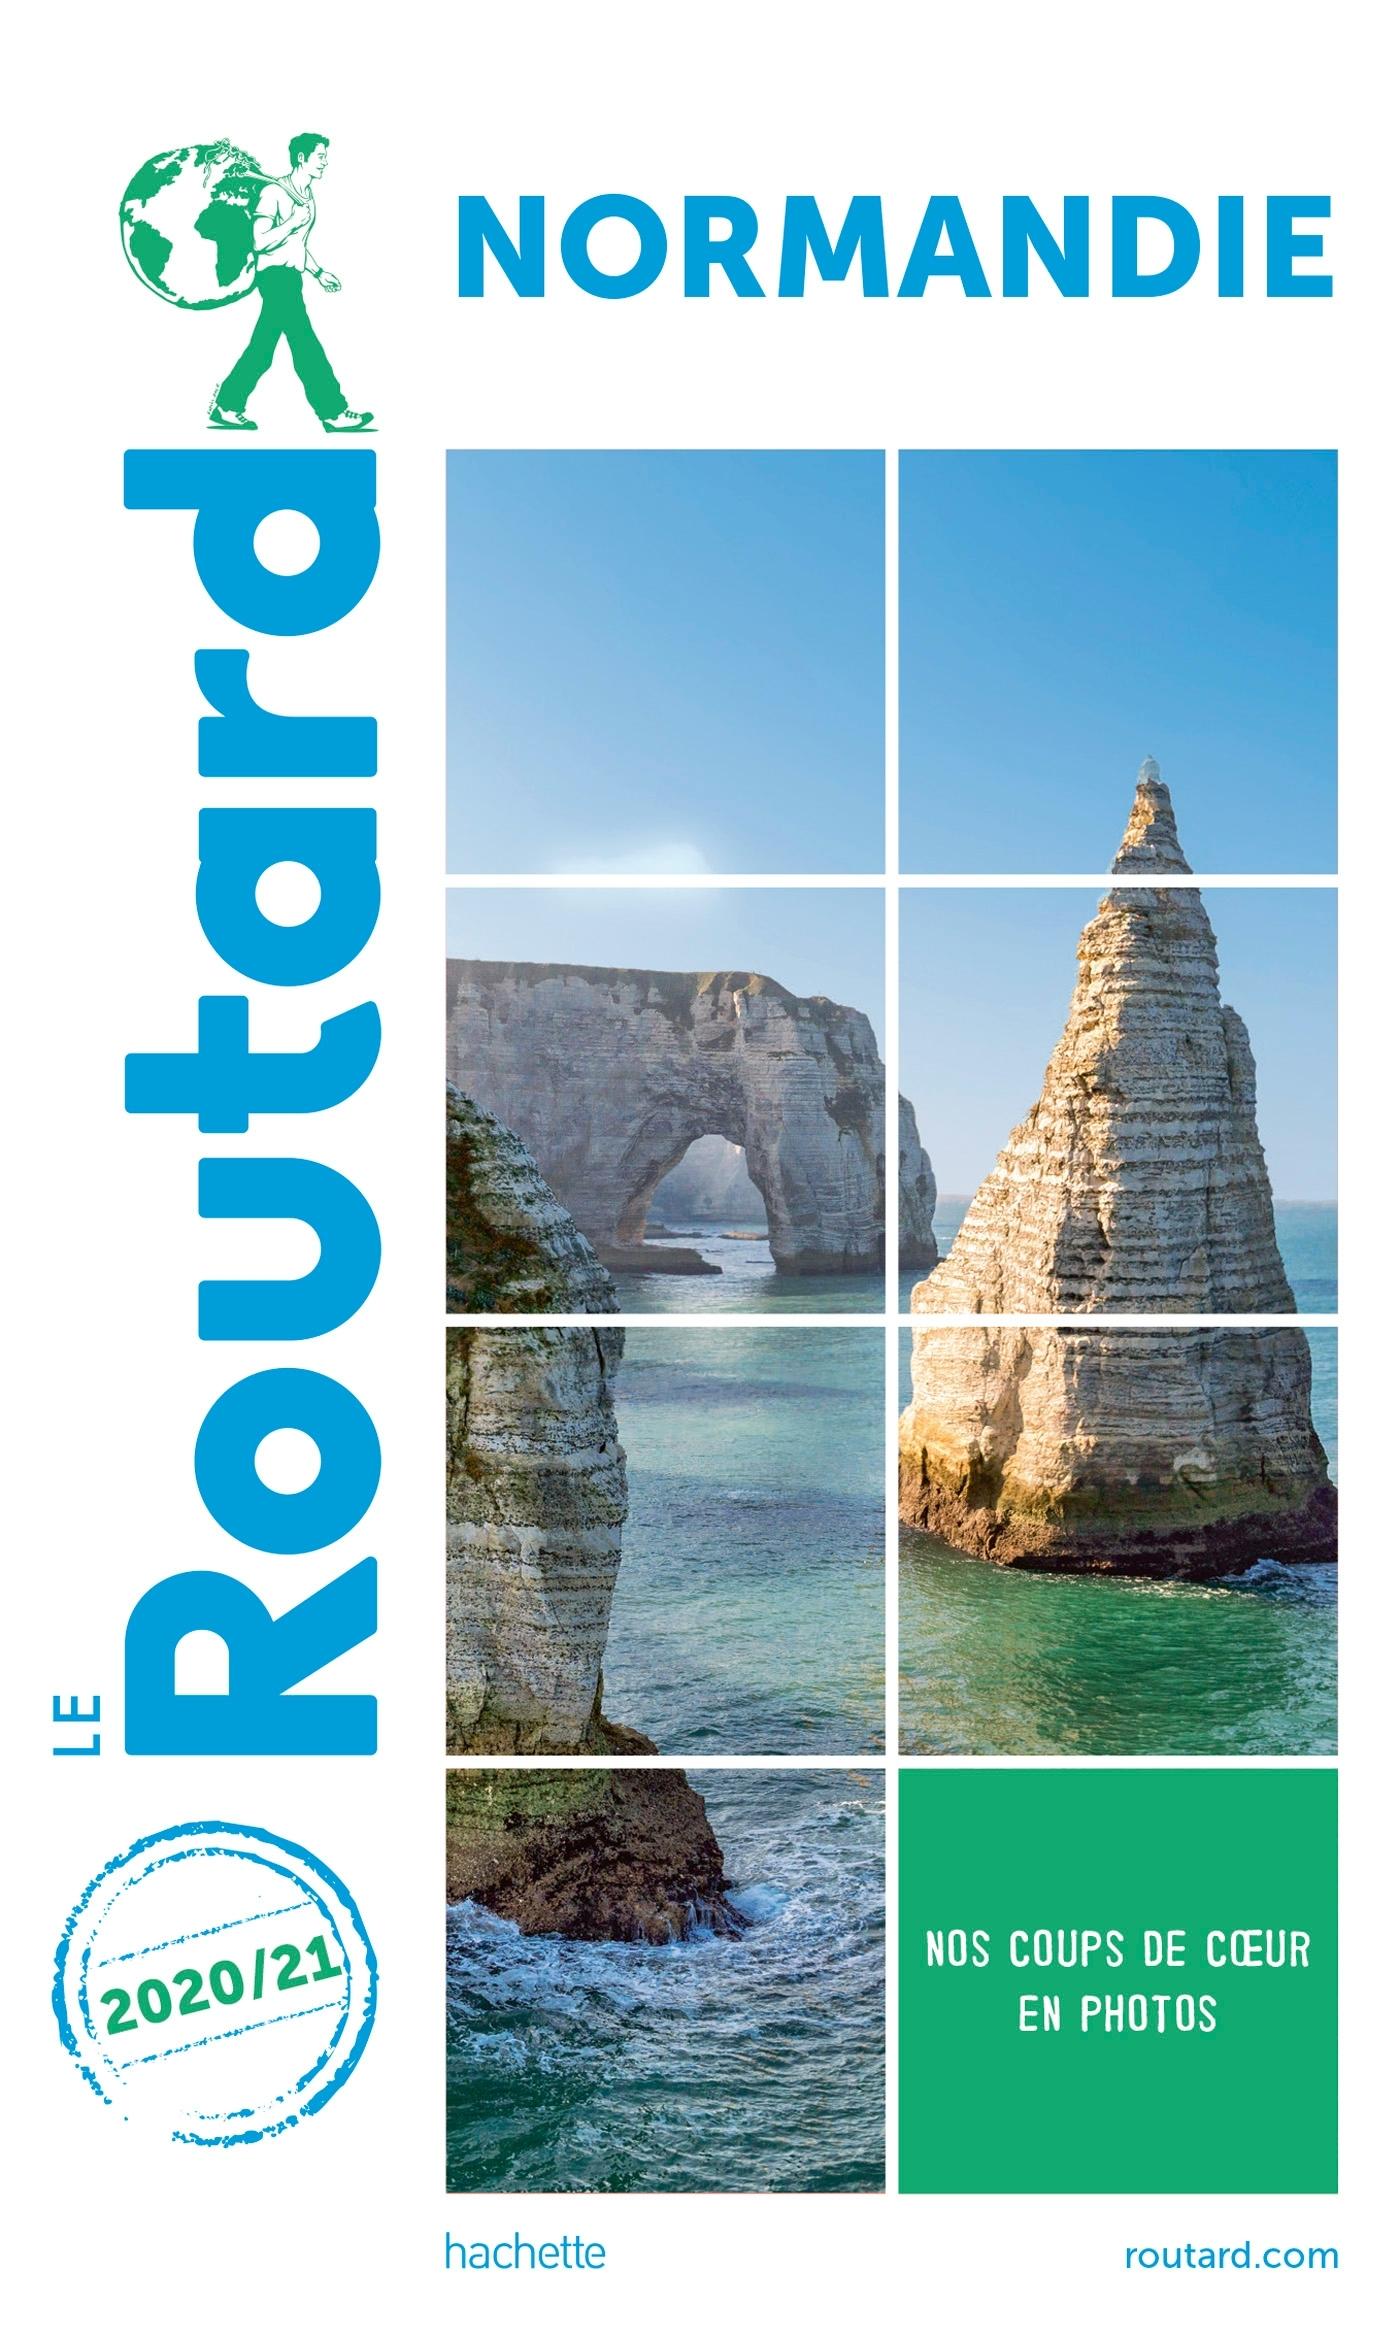 GUIDE DU ROUTARD NORMANDIE 2020/21